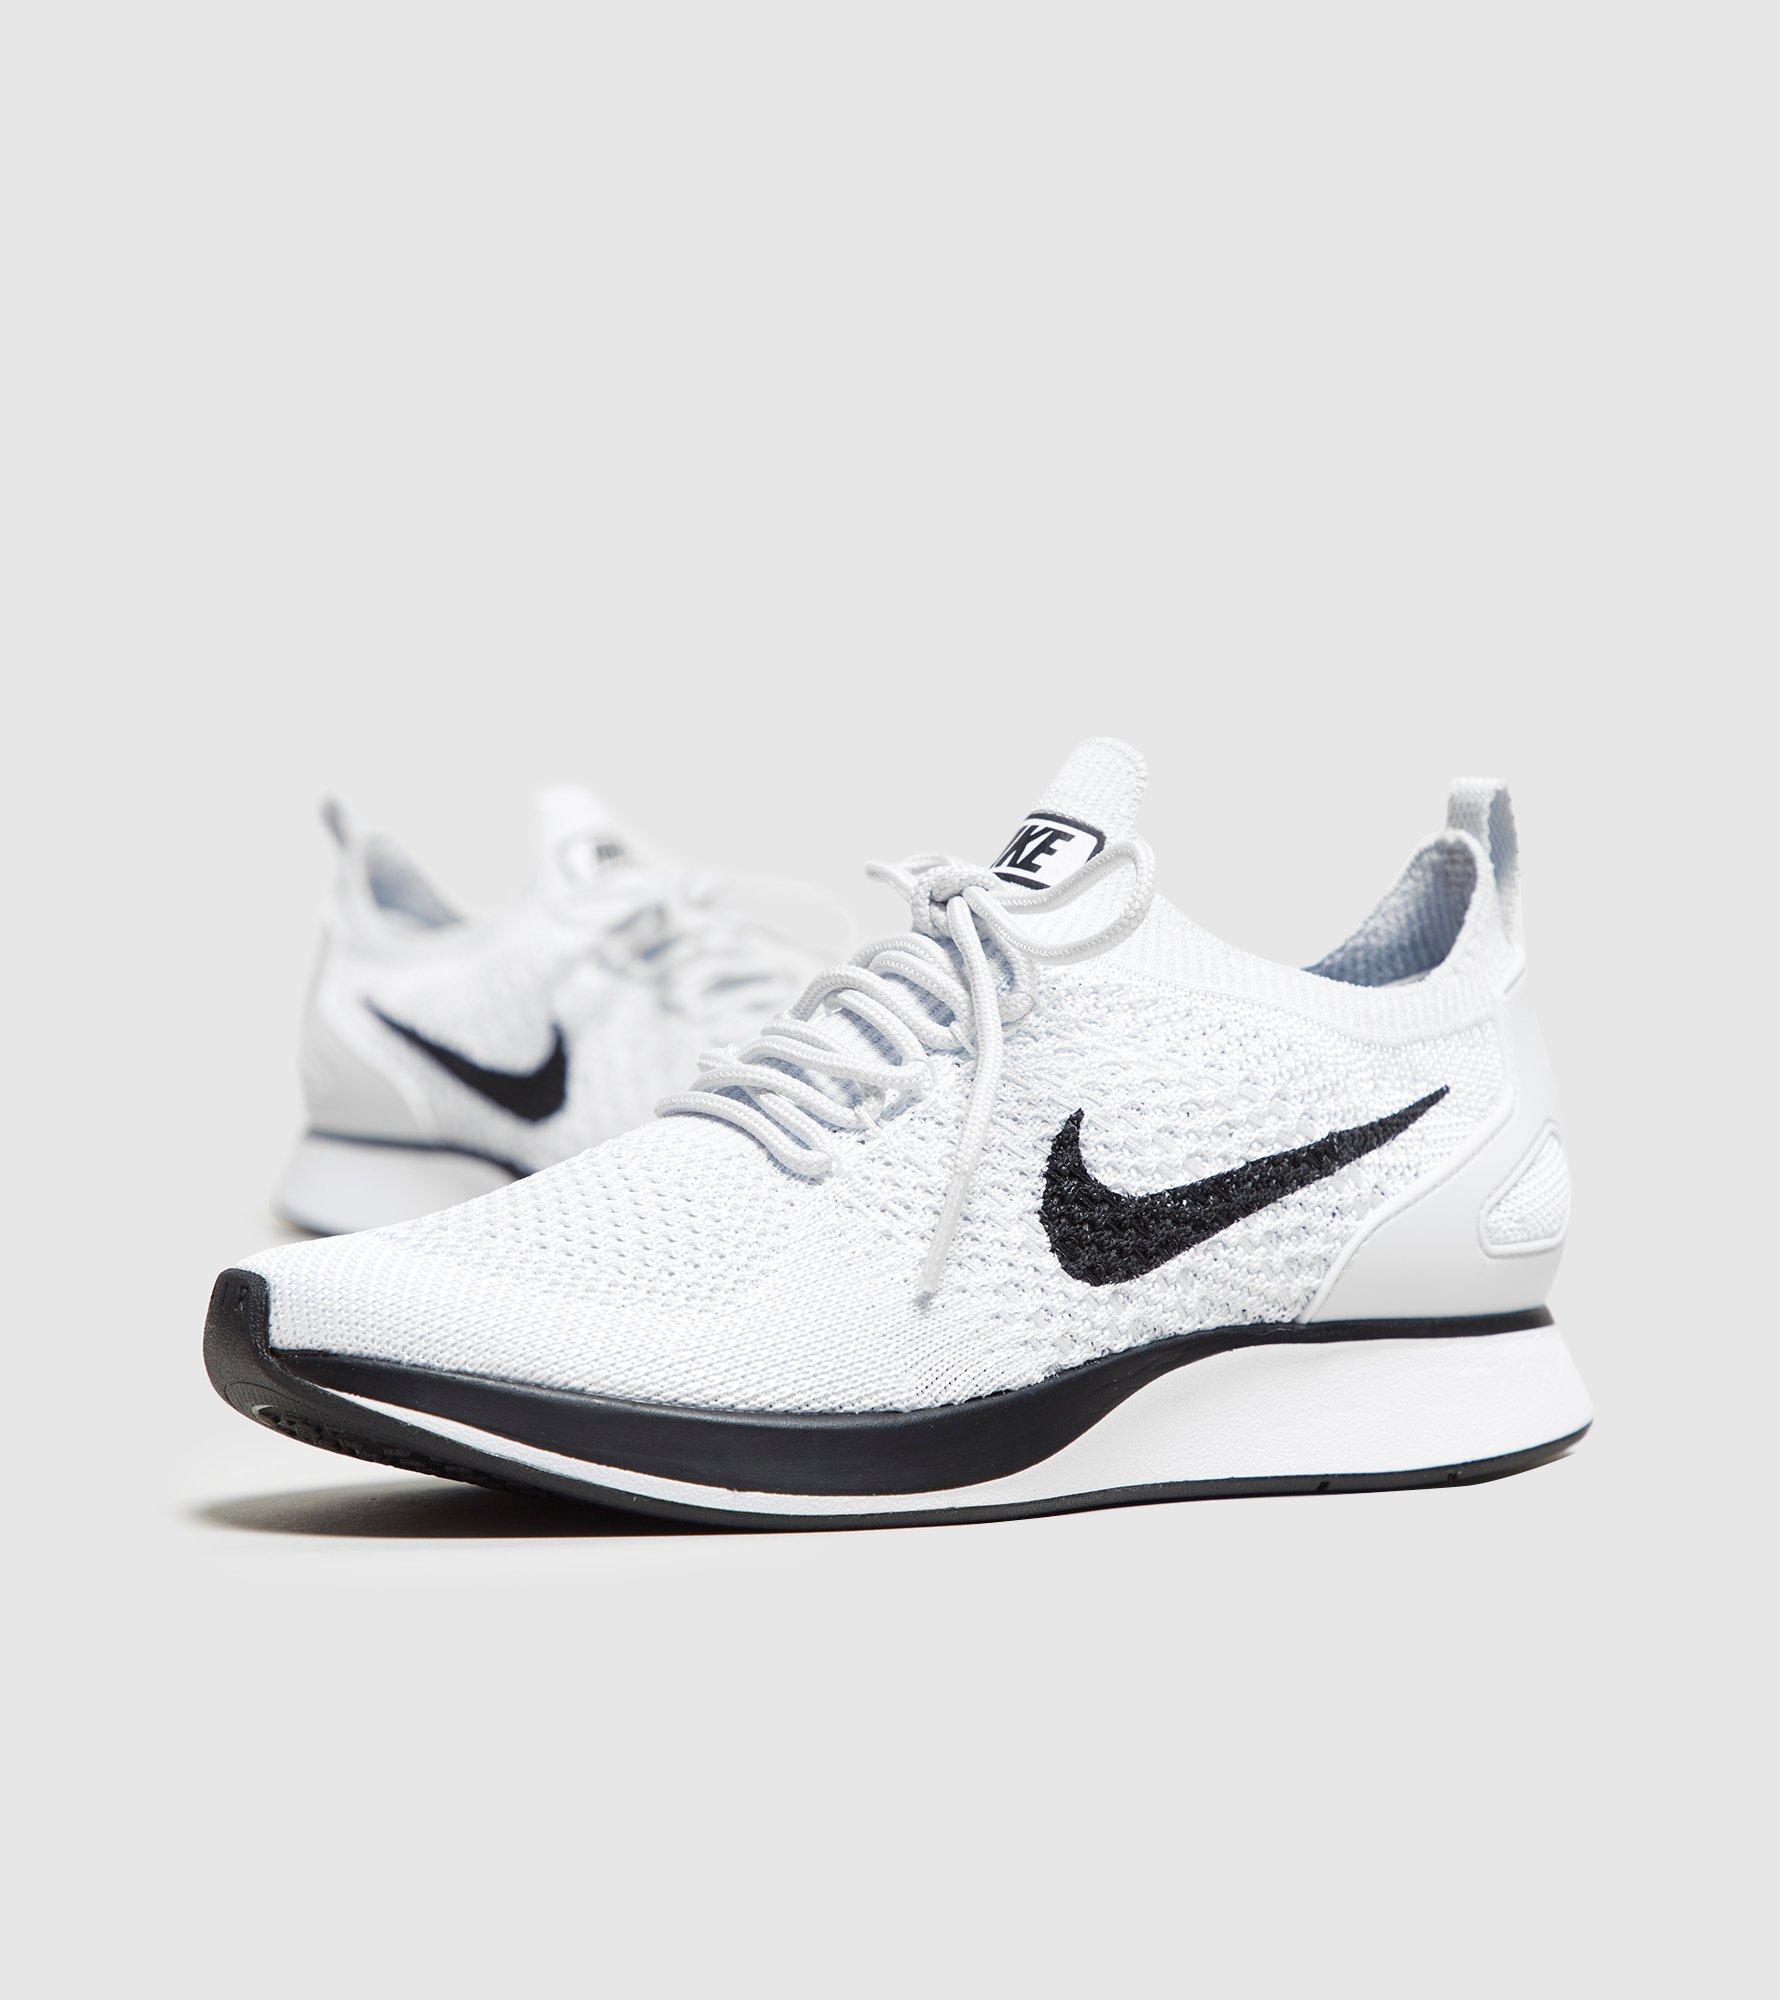 7d6f96e9a9a14 Lyst - Nike Air Zoom Mariah Flyknit Racerback Women s in White